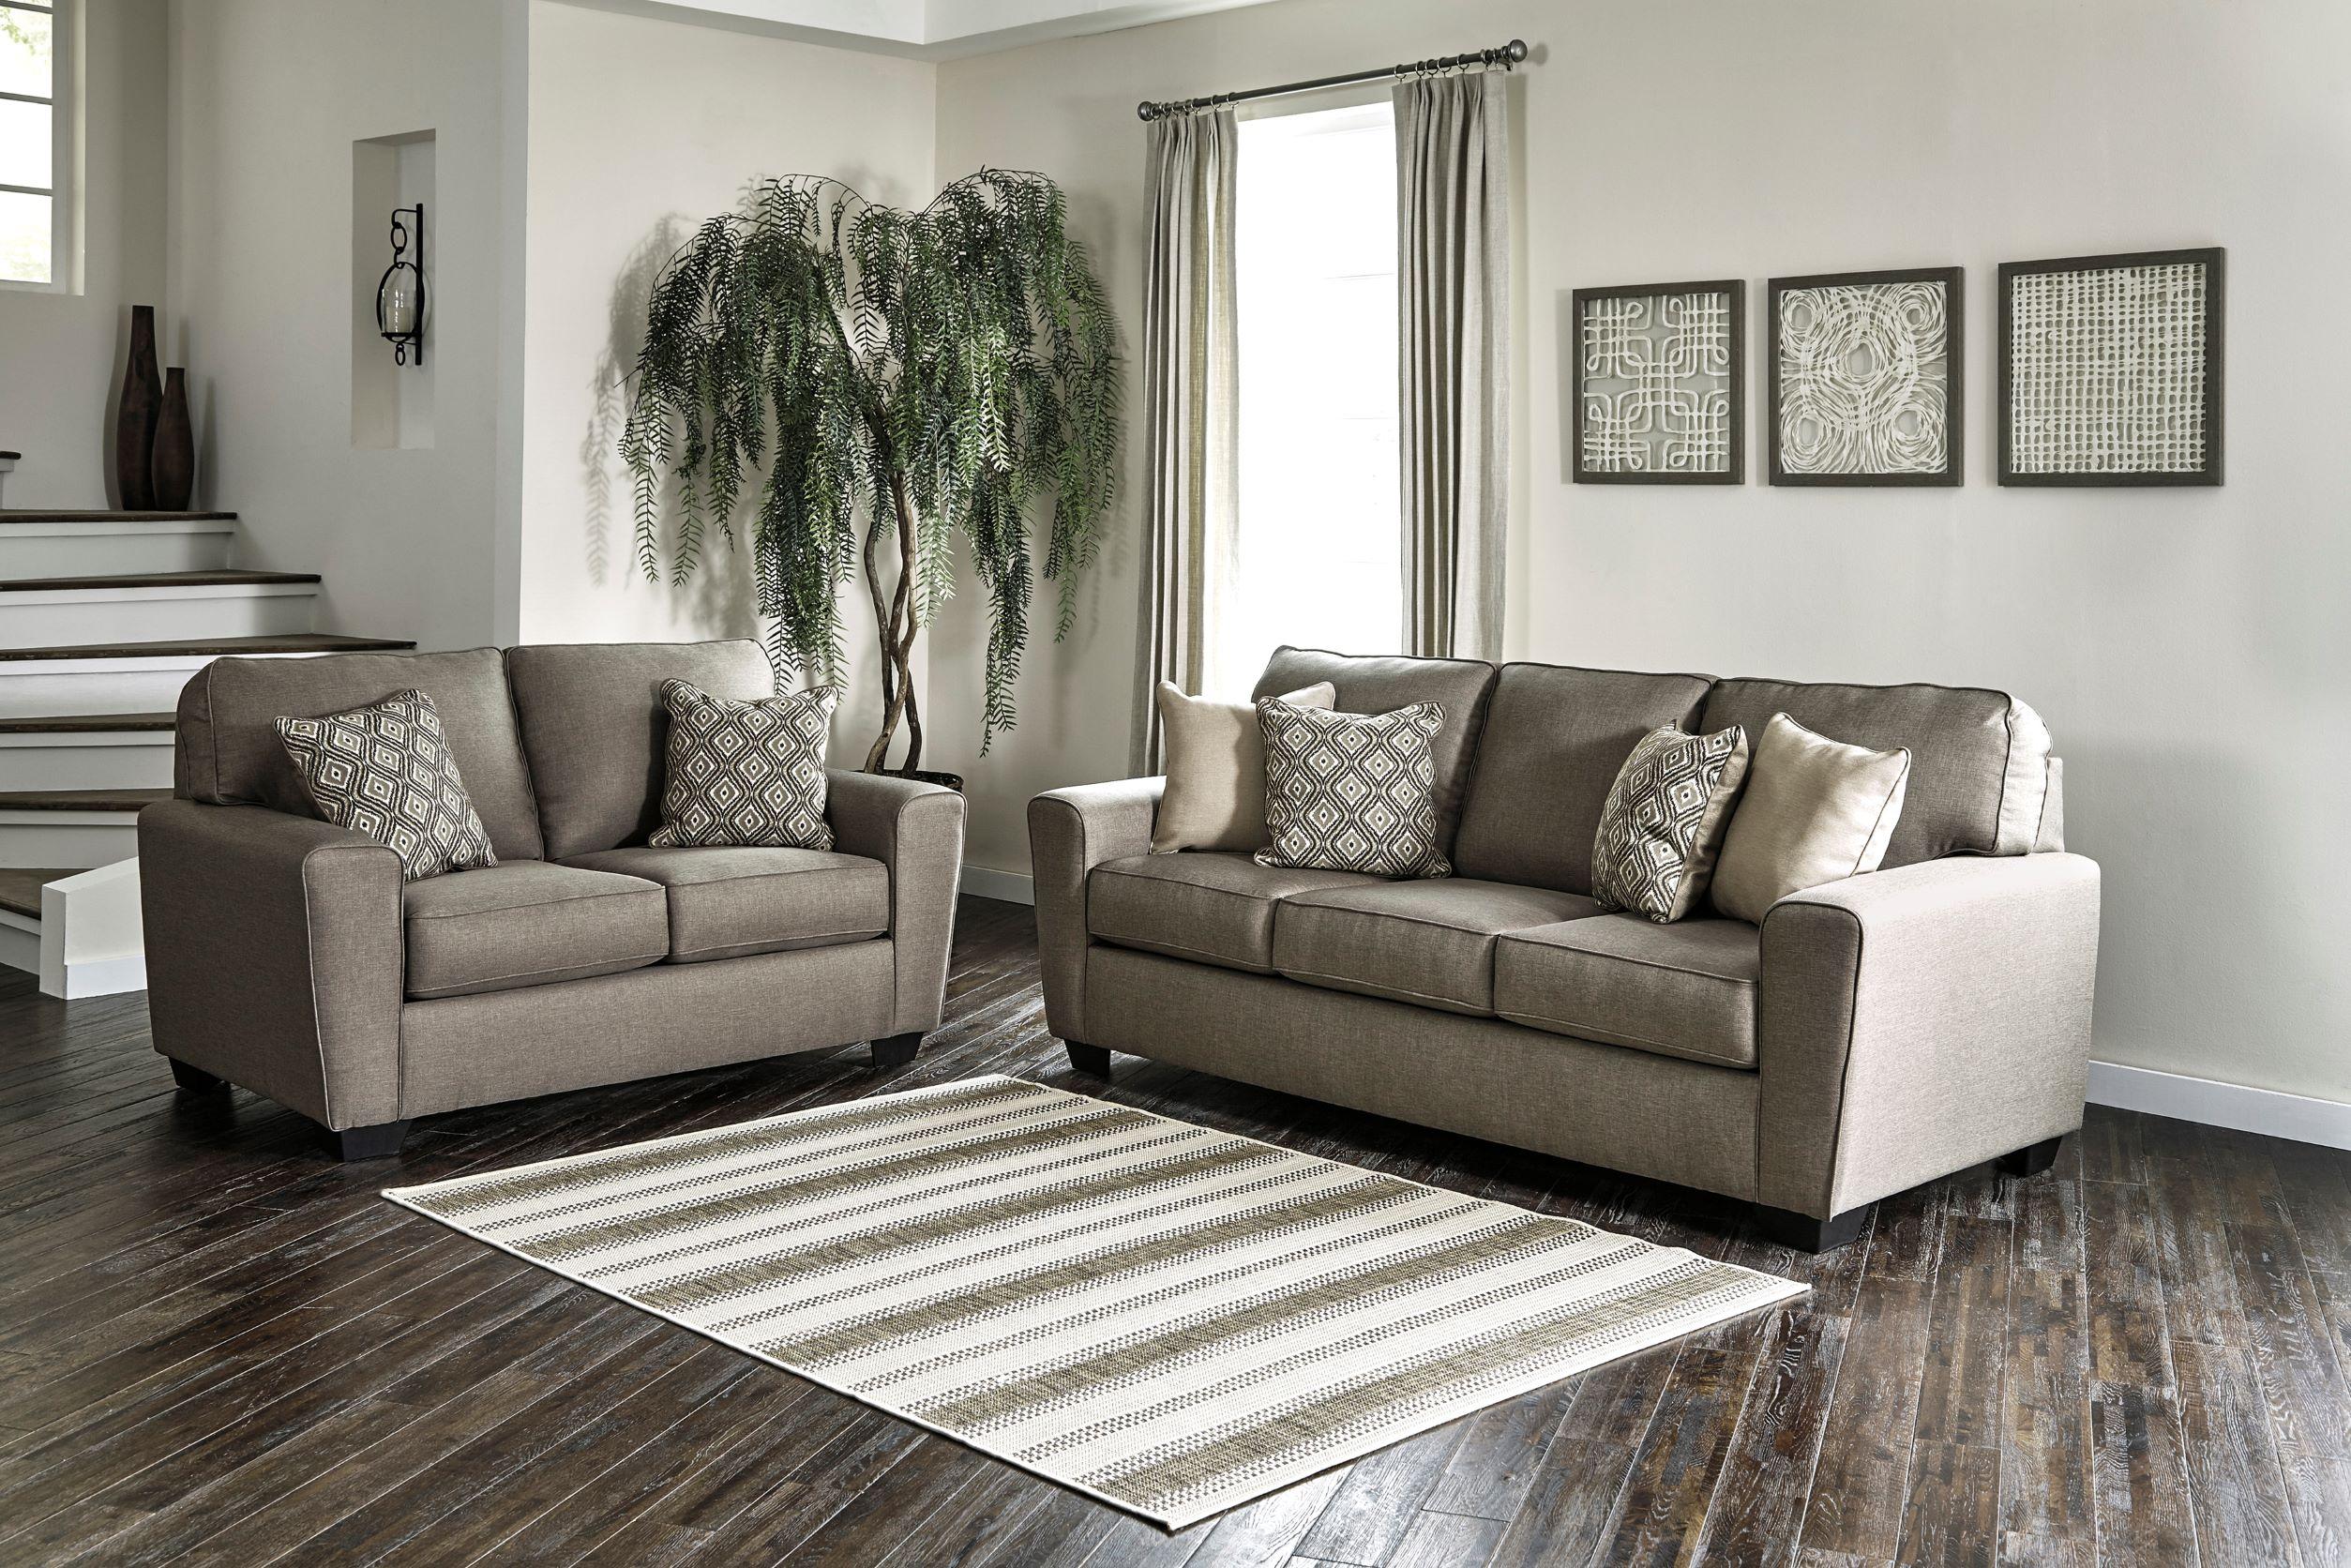 91202 Sofa and Love